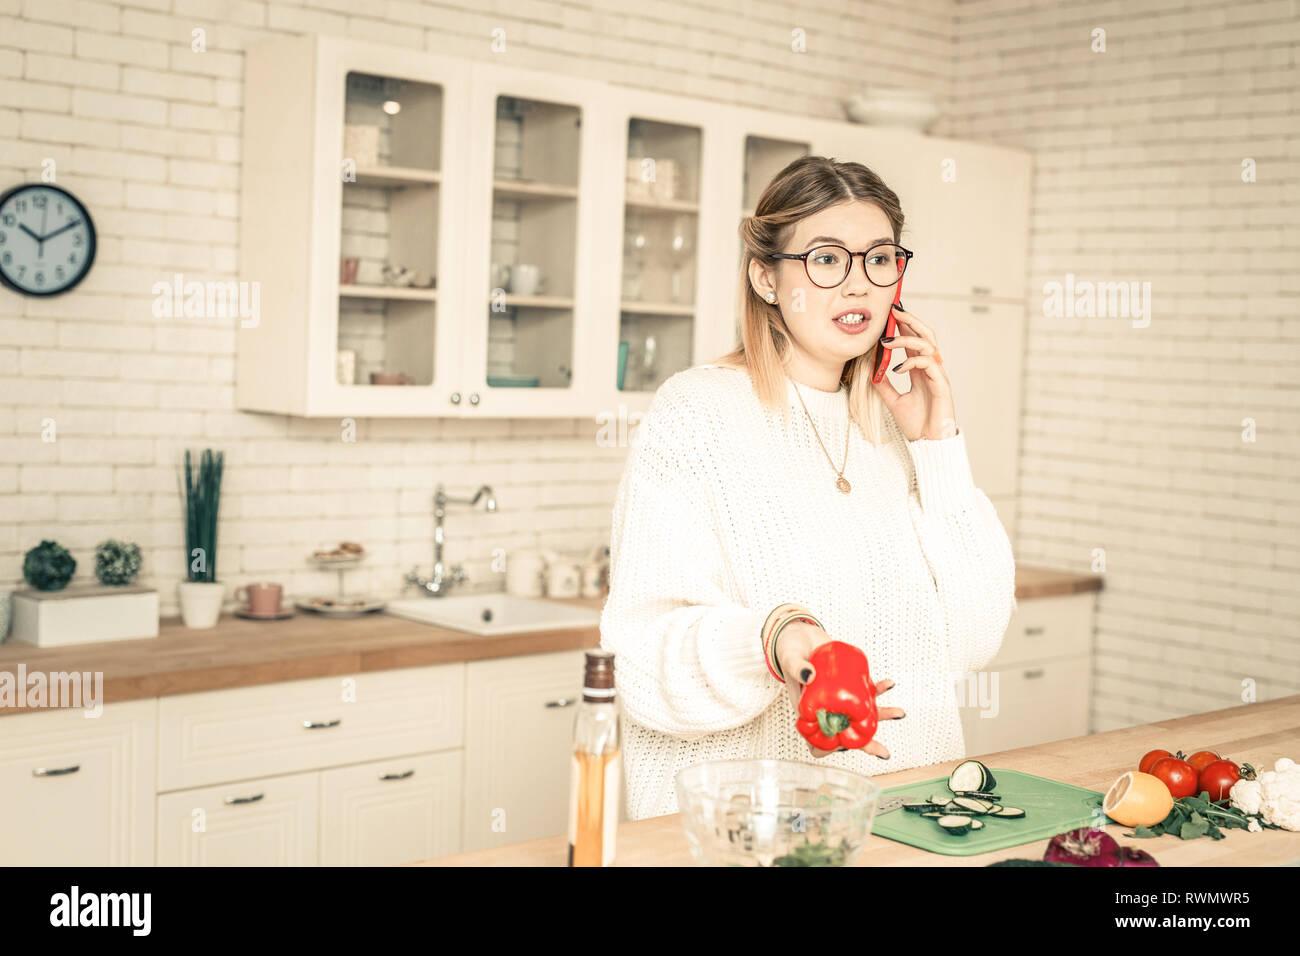 Curieux bavard woman having conversation via smartphone Photo Stock